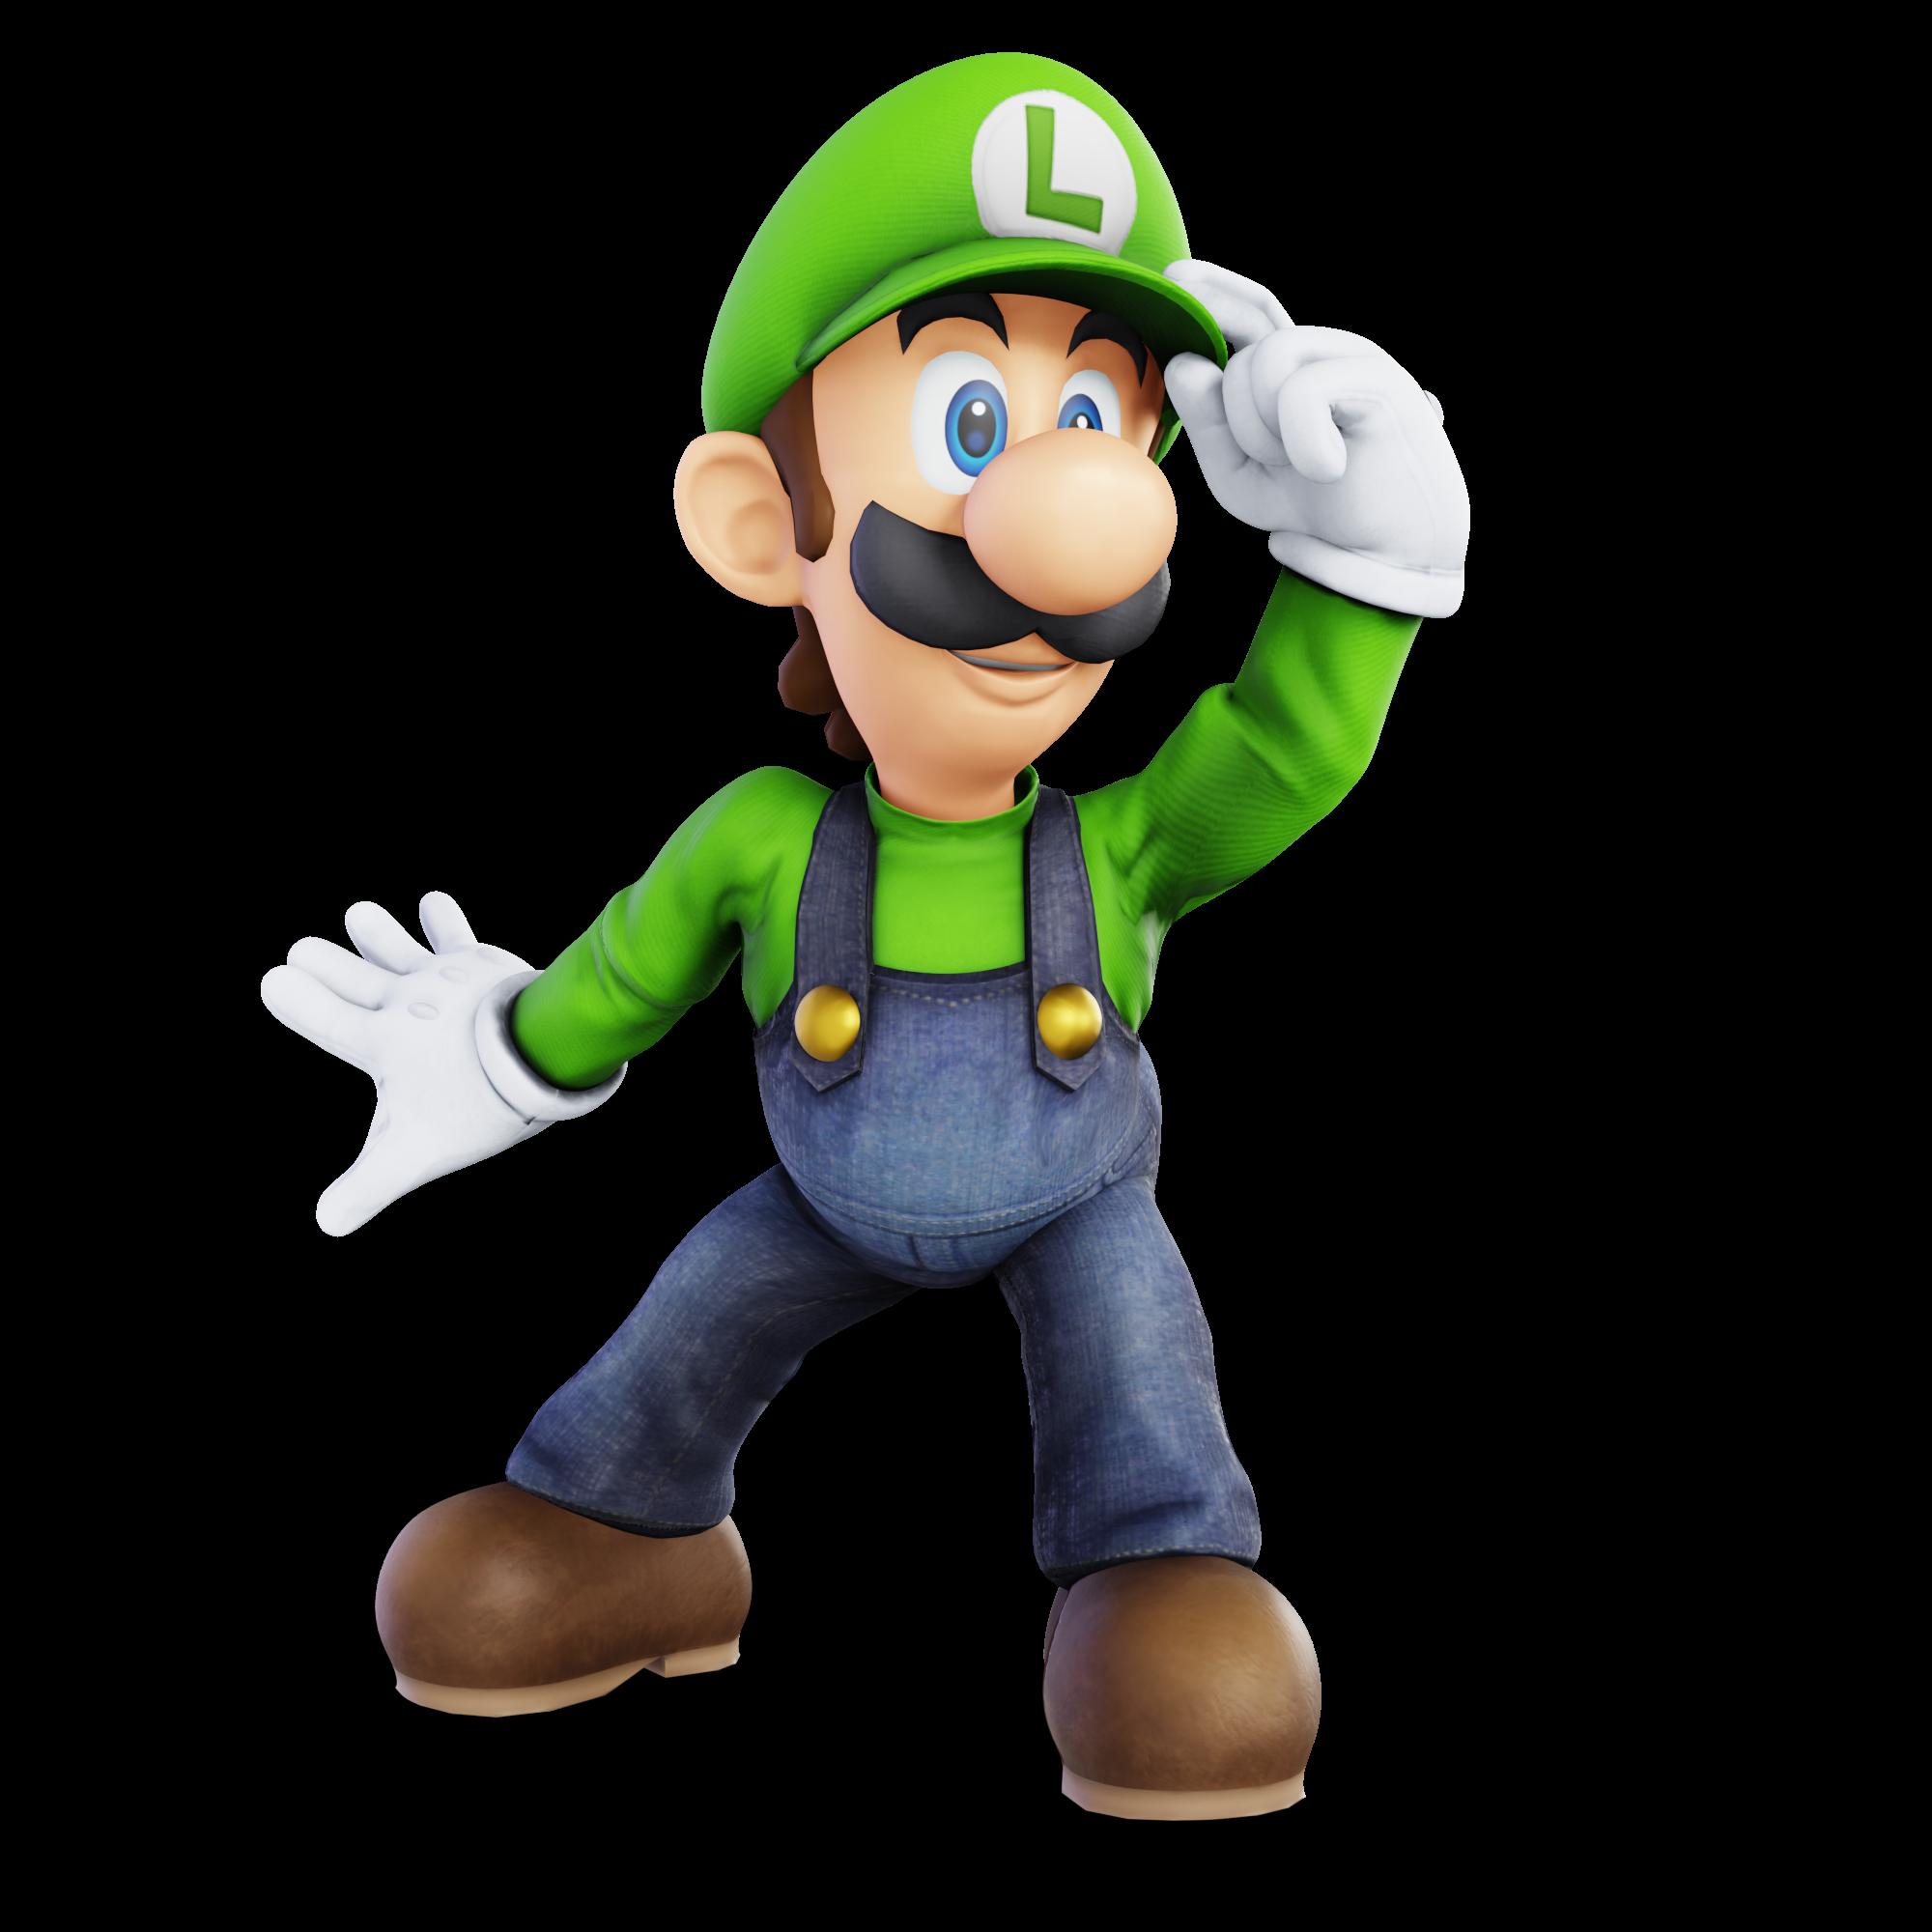 Luigi Melee Render Remake By Unbecomingname On Deviantart Luigi Super Mario Bros Mario And Luigi